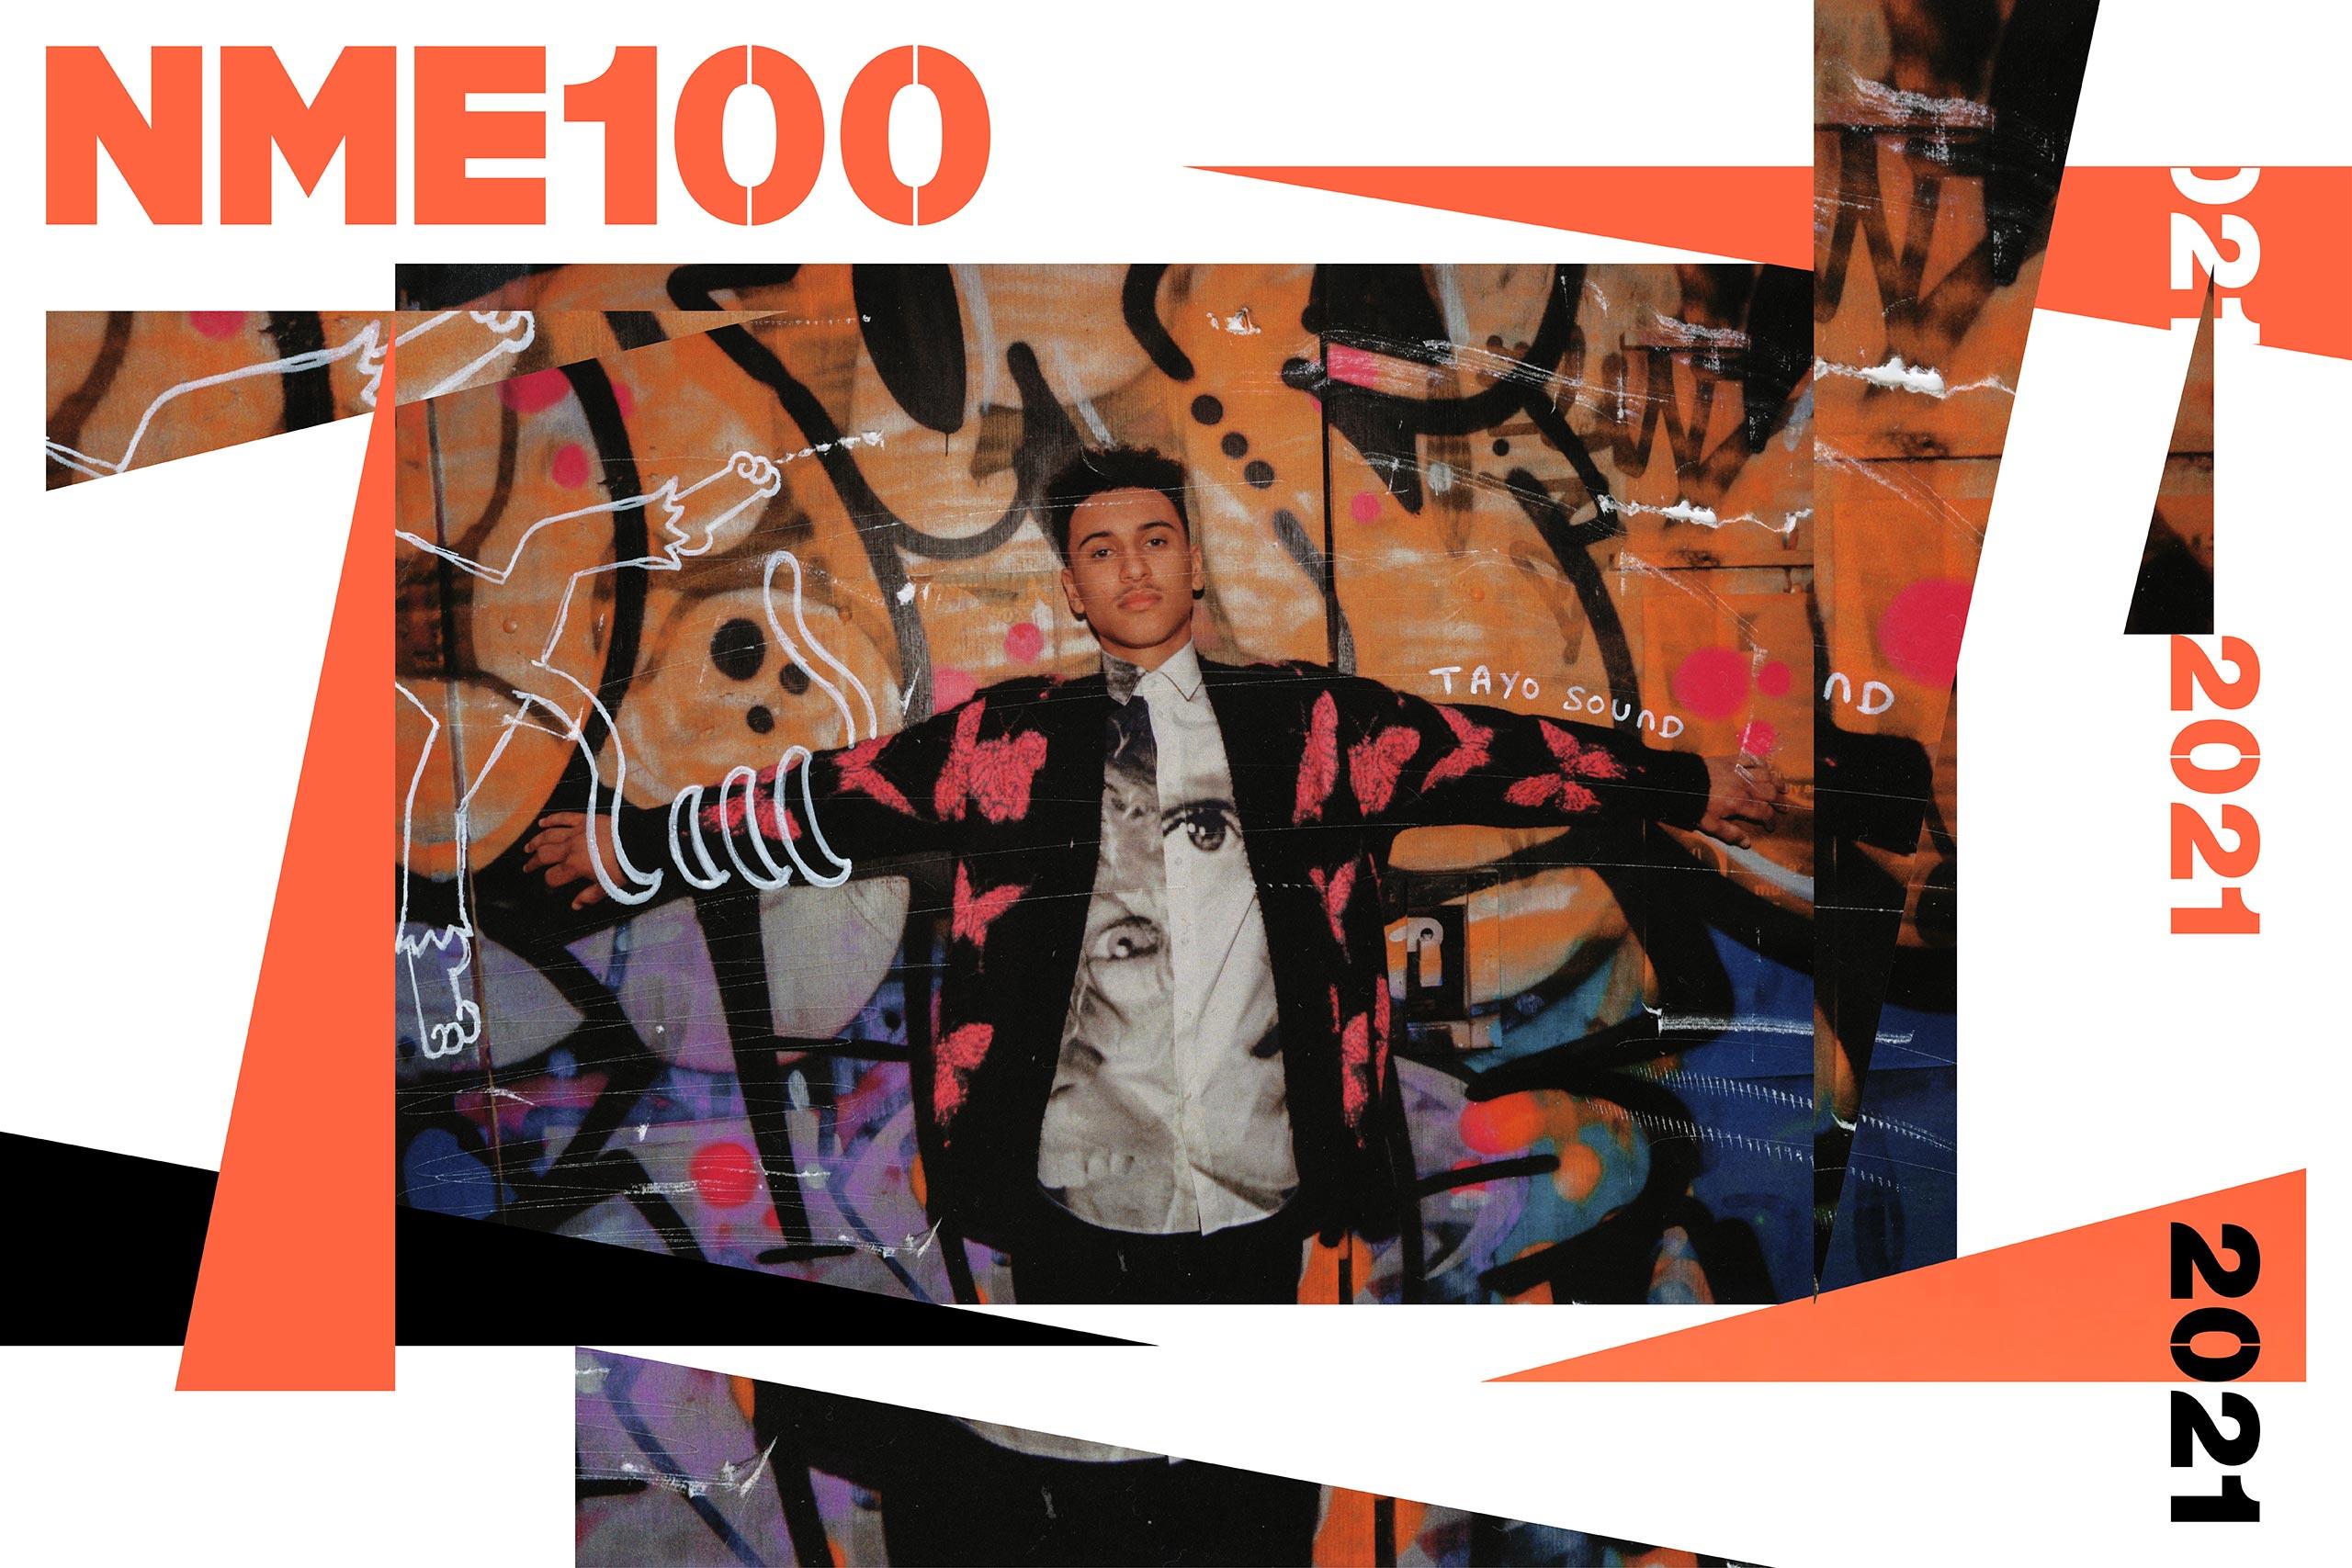 NME 100 tayo sound